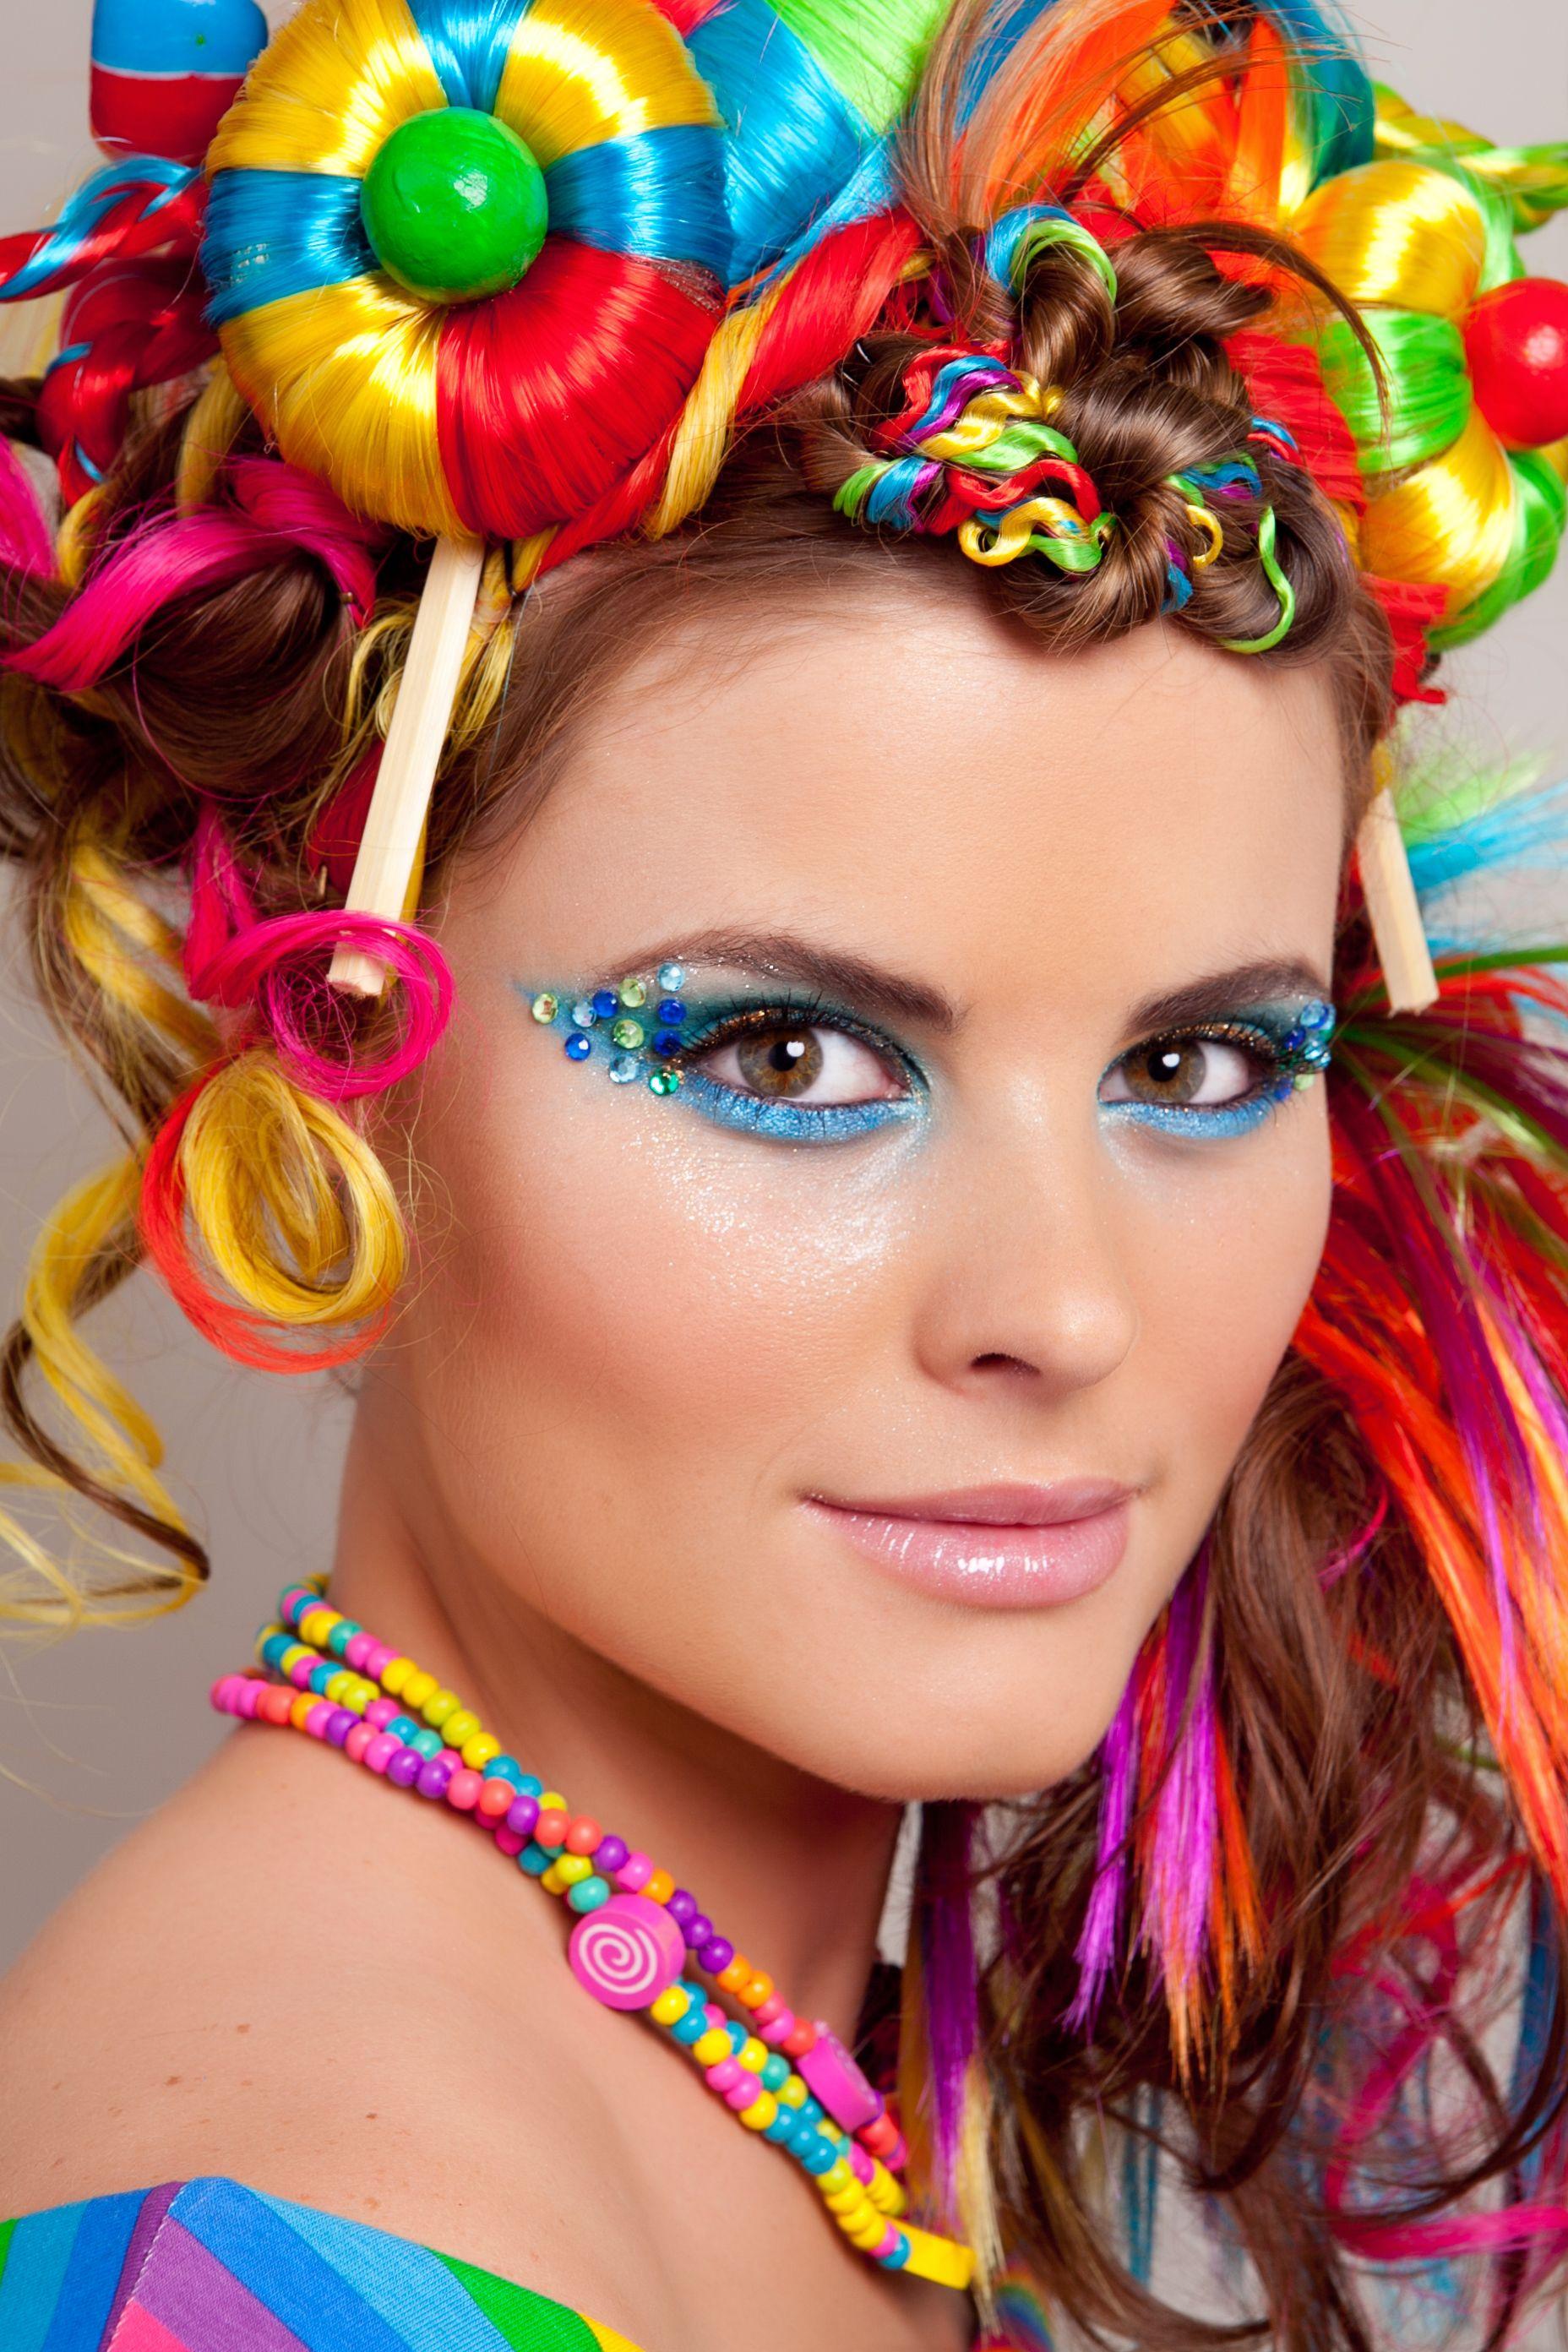 Diy Candyland Costume - Fantasia candylandhalloween costumescostume ideascandy